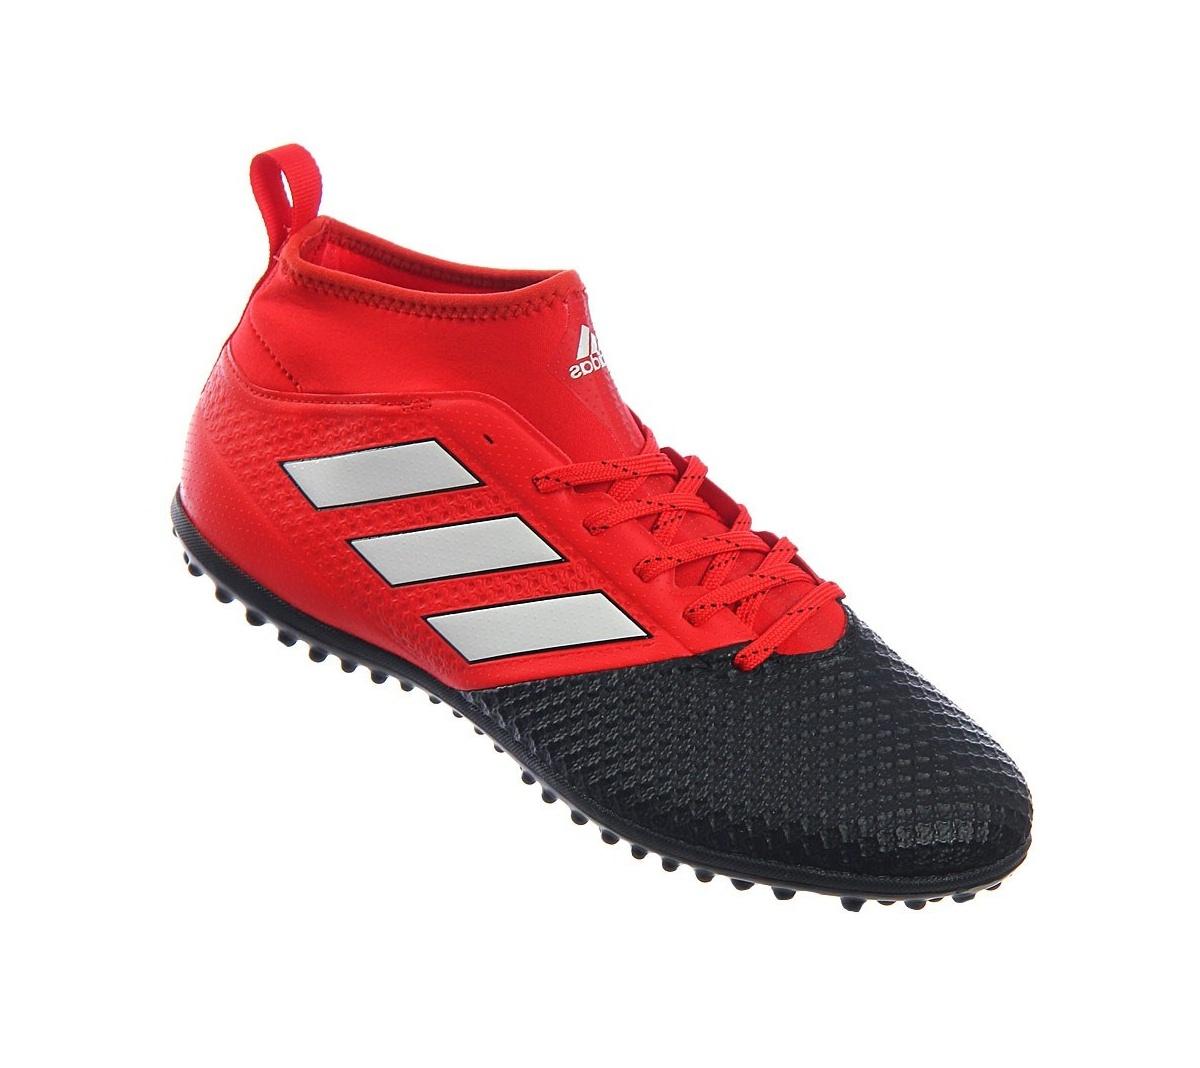 1063048b8869a Chuteira Adidas Ace 17.3 PRIMEMESH Society Chuteira Adidas Ace 17.3  PRIMEMESH Society ...